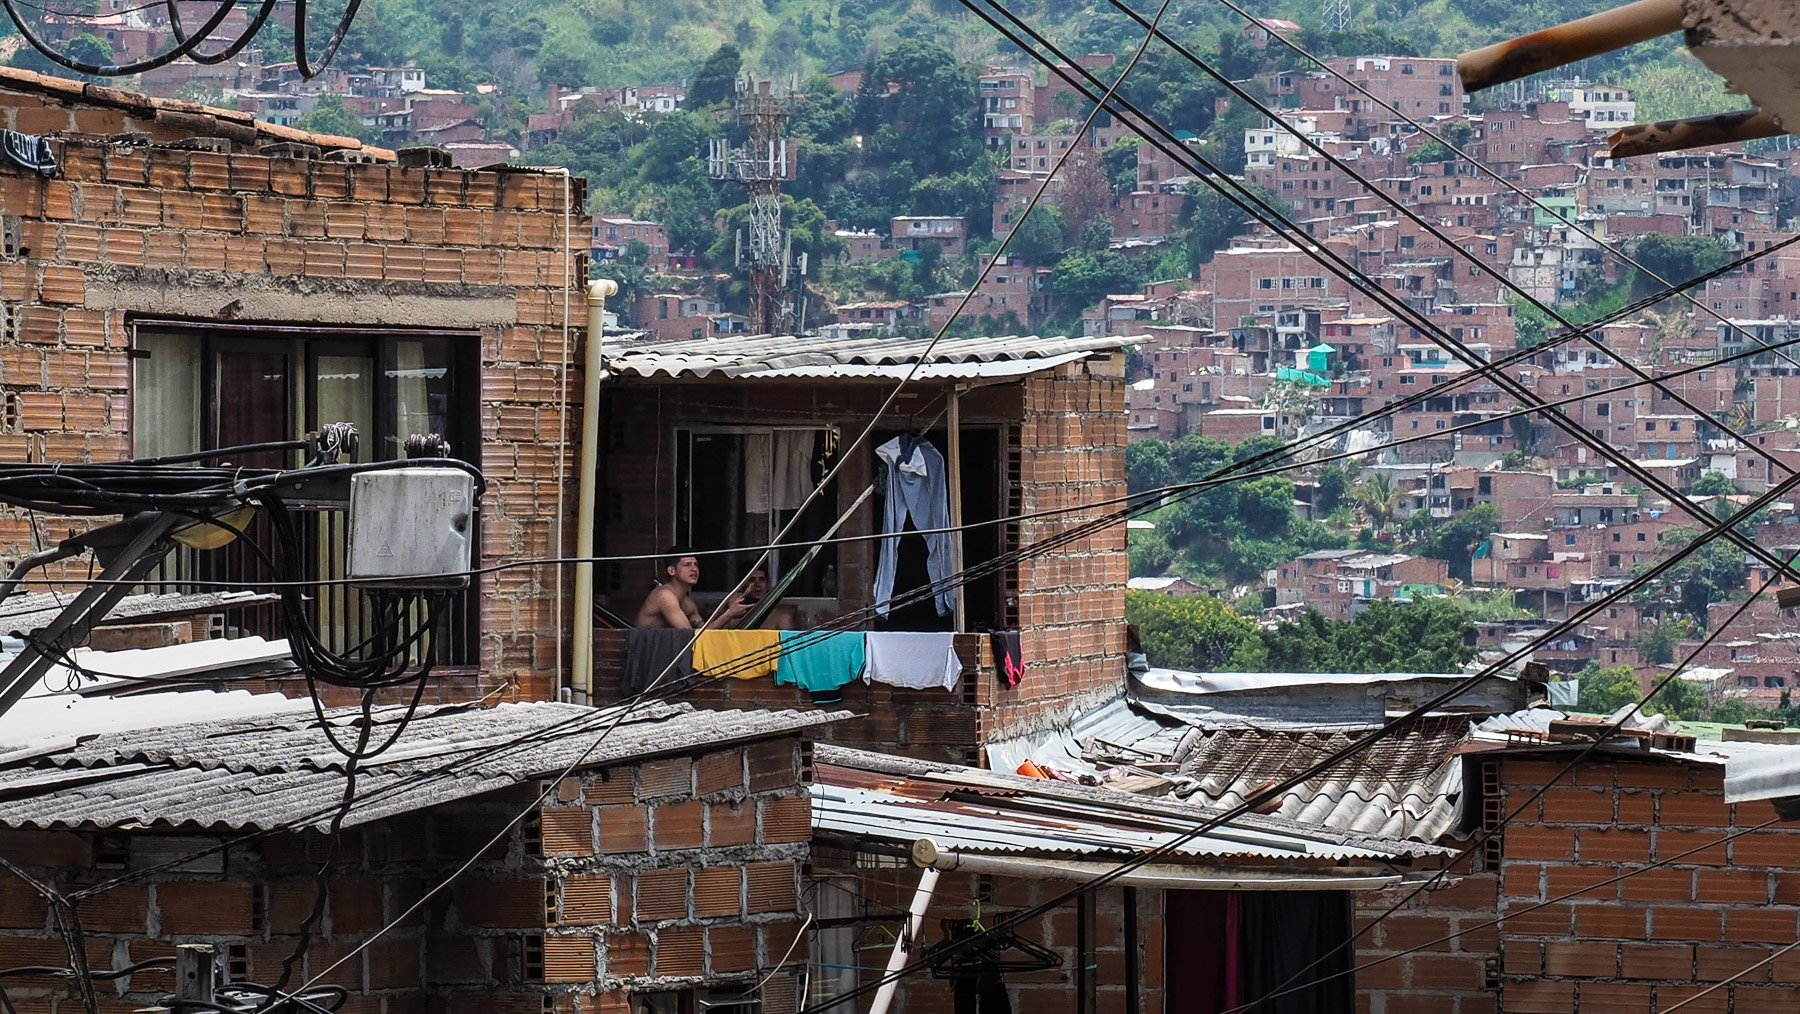 Illegal gebaute, ineinander verschachtelte Häuser an den steilen Berghängen